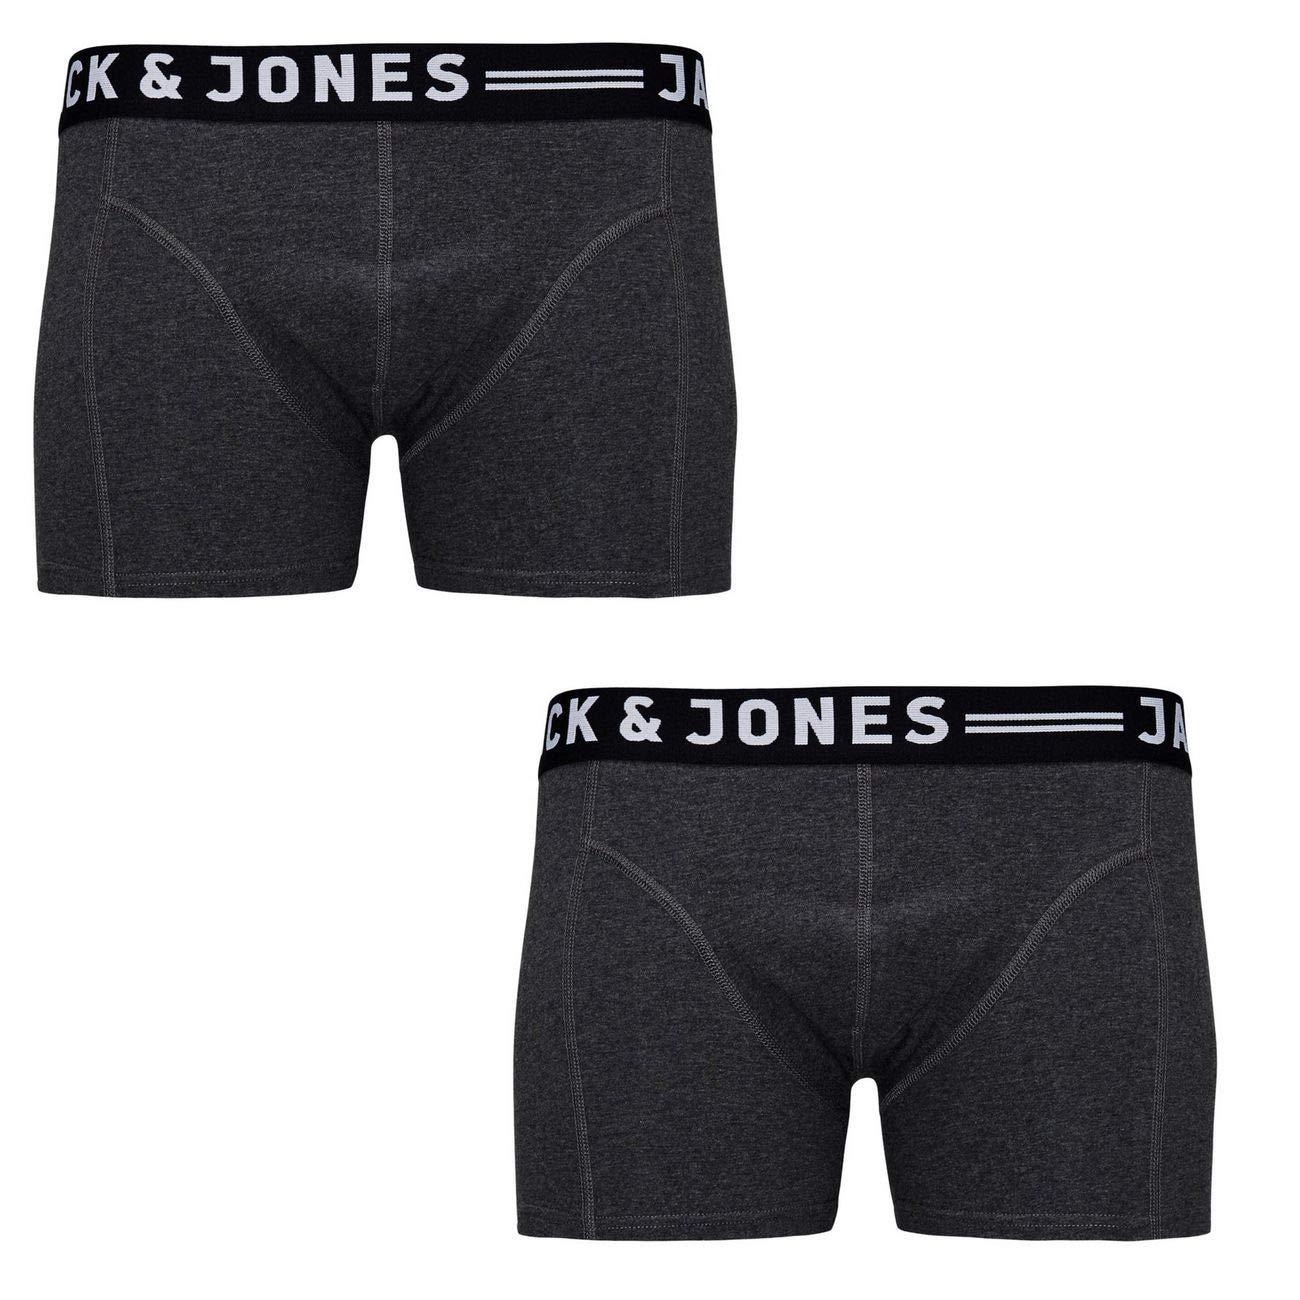 JACSENSE schwarz JACK /& JONES Boxershorts Trunks Unterhose 3er-Box